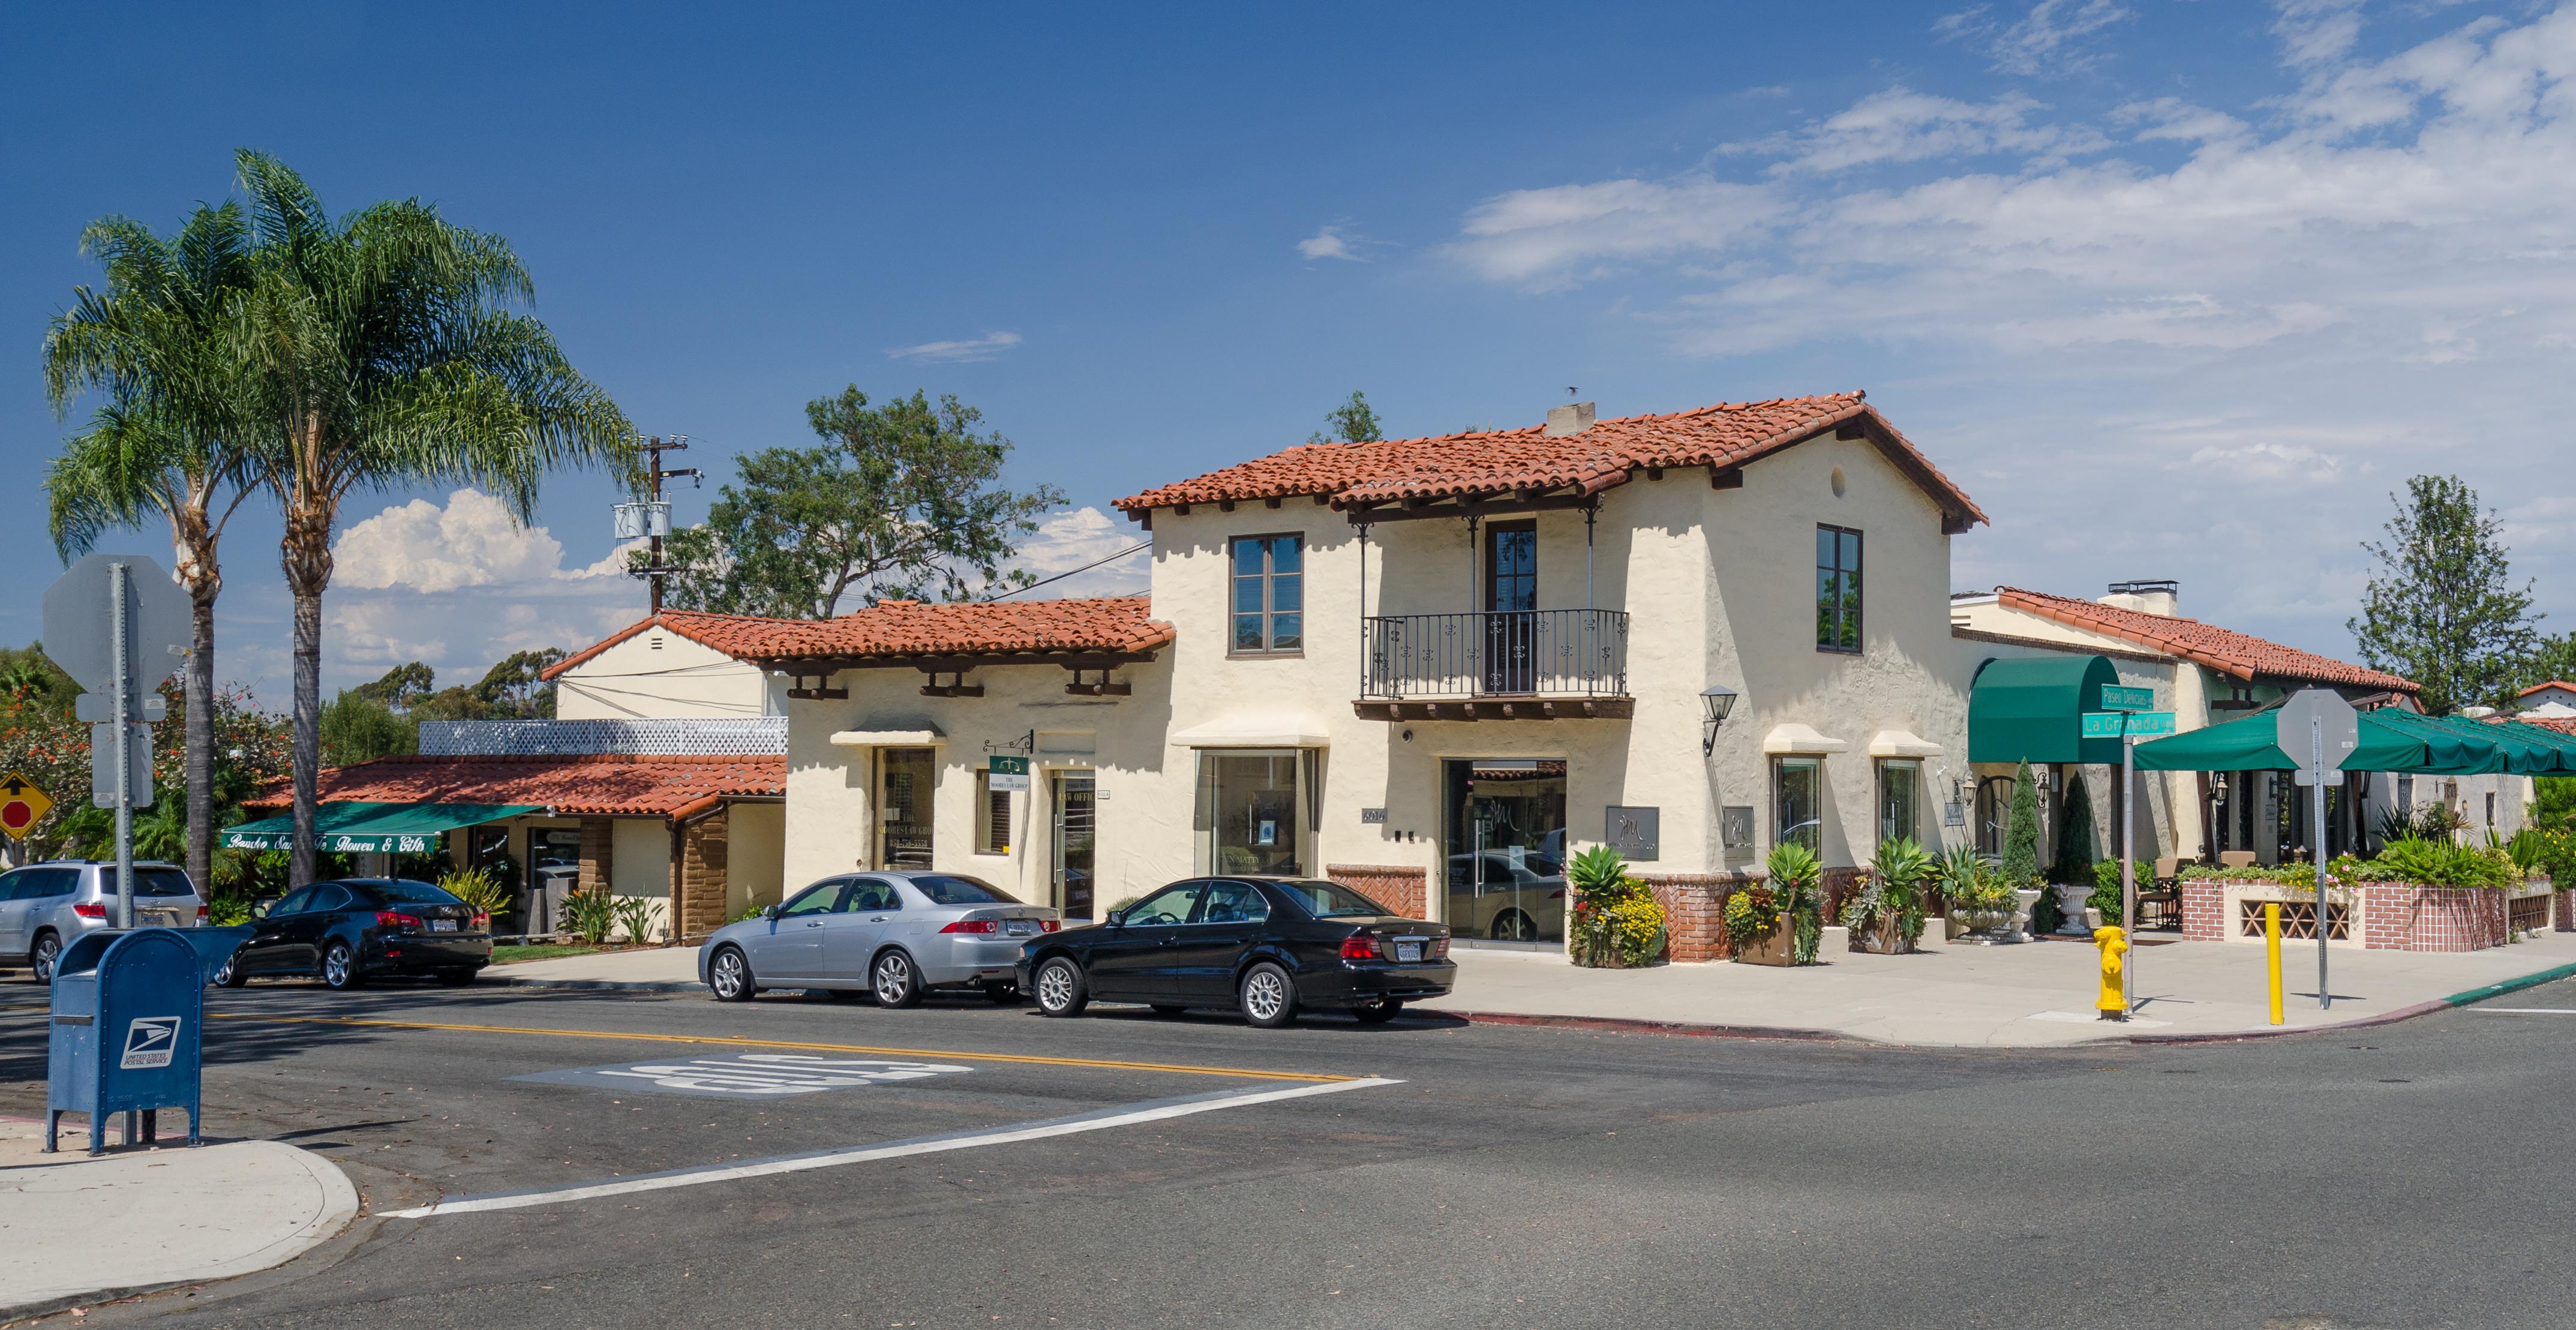 Rancho_Santa_Fe_street_view_2013